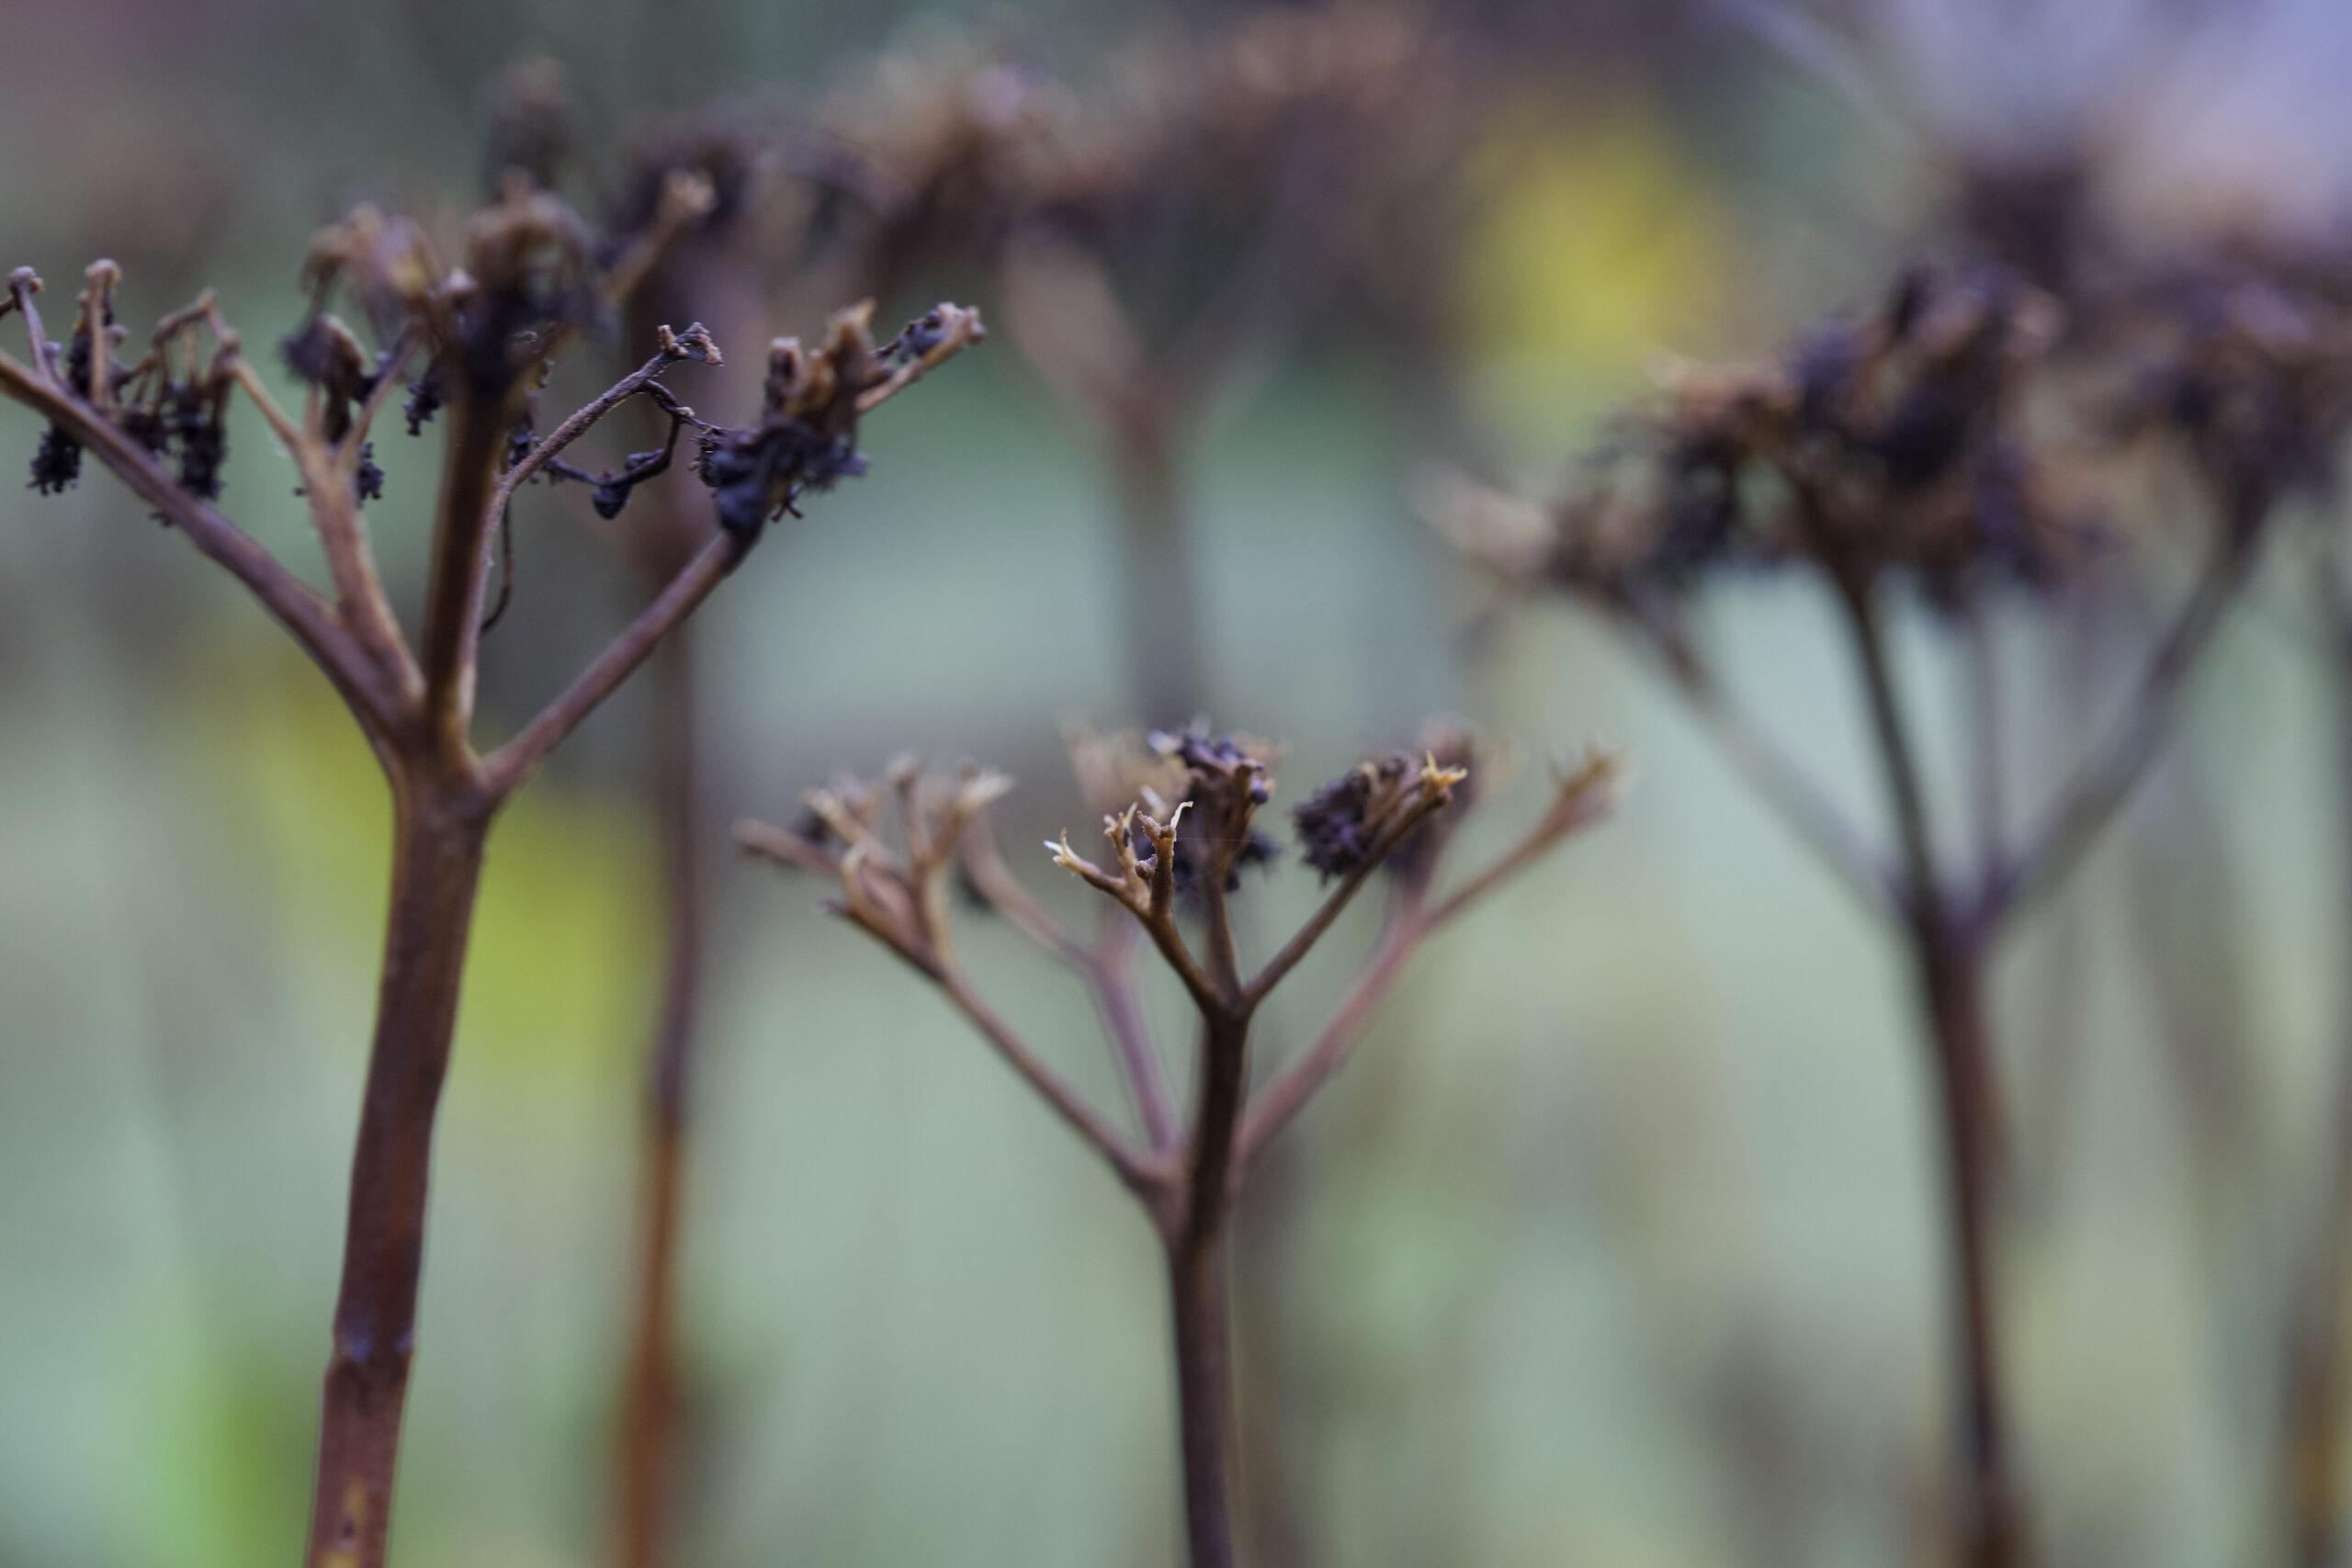 Closeup of dark-colored delicate flowers